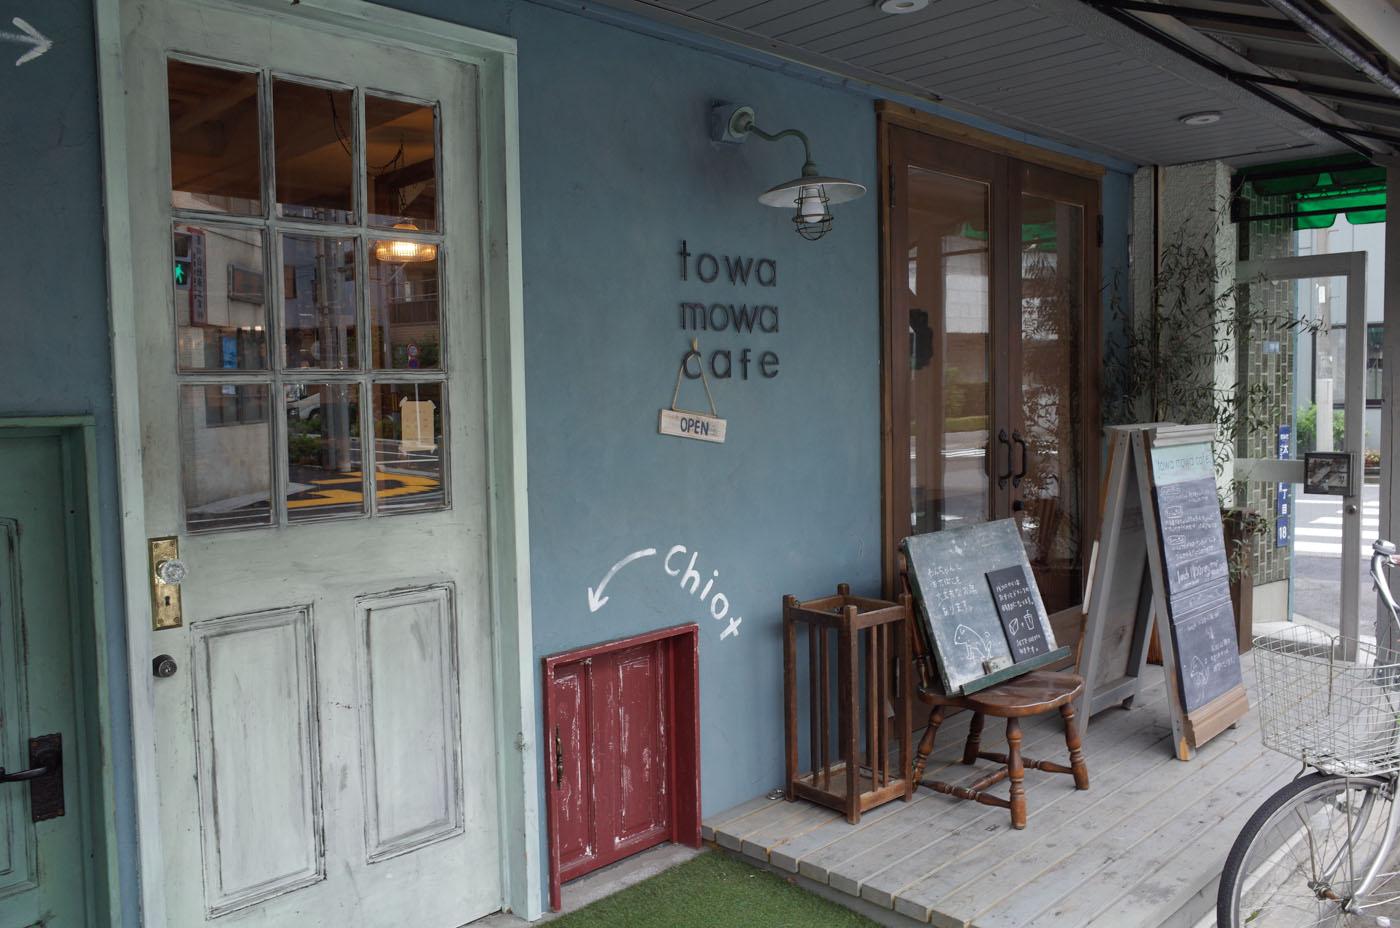 towa mowa cafe-01